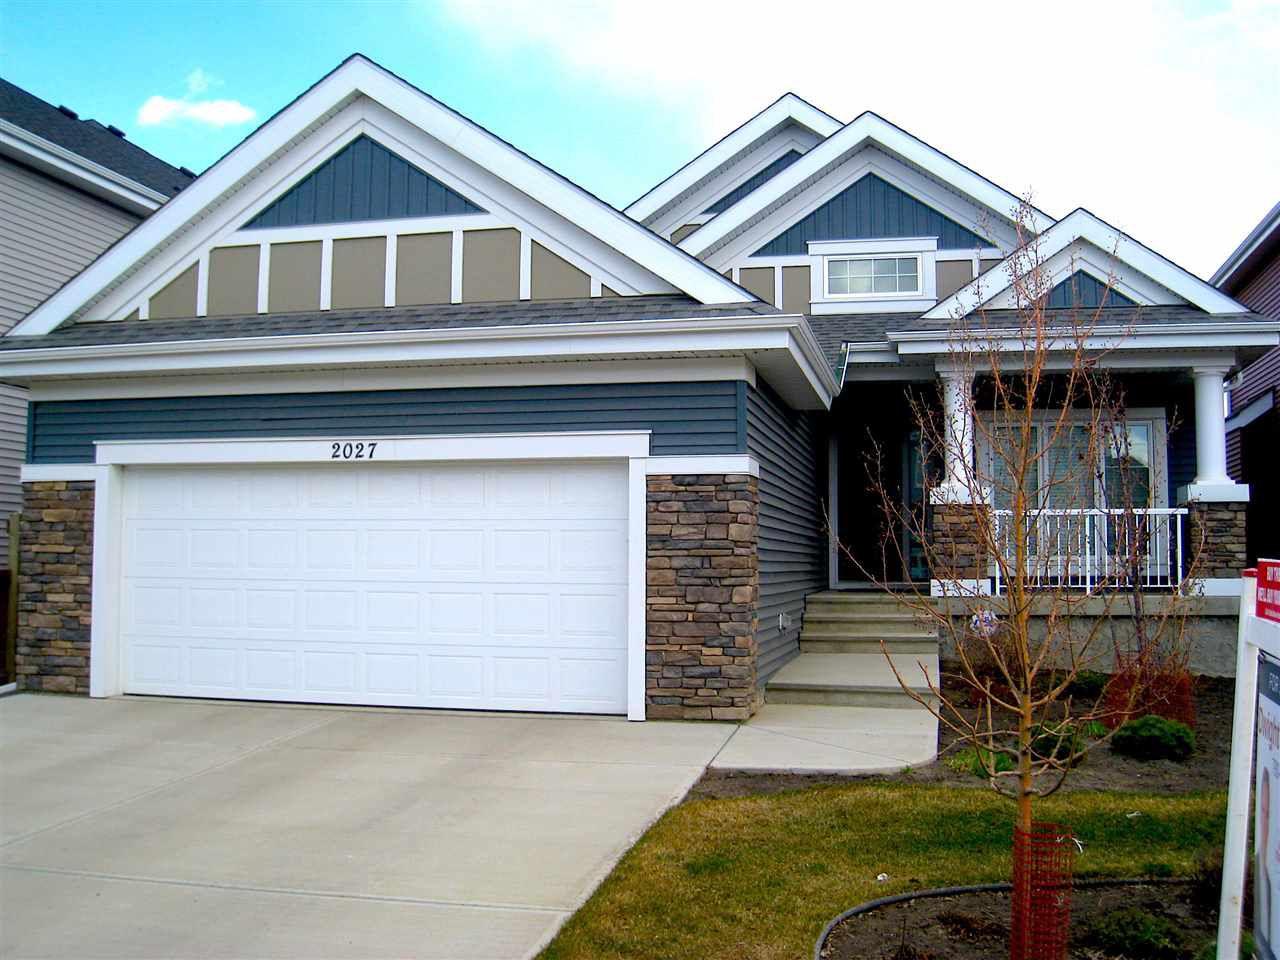 Main Photo: 2027 90 Street in Edmonton: Zone 53 House for sale : MLS®# E4157388